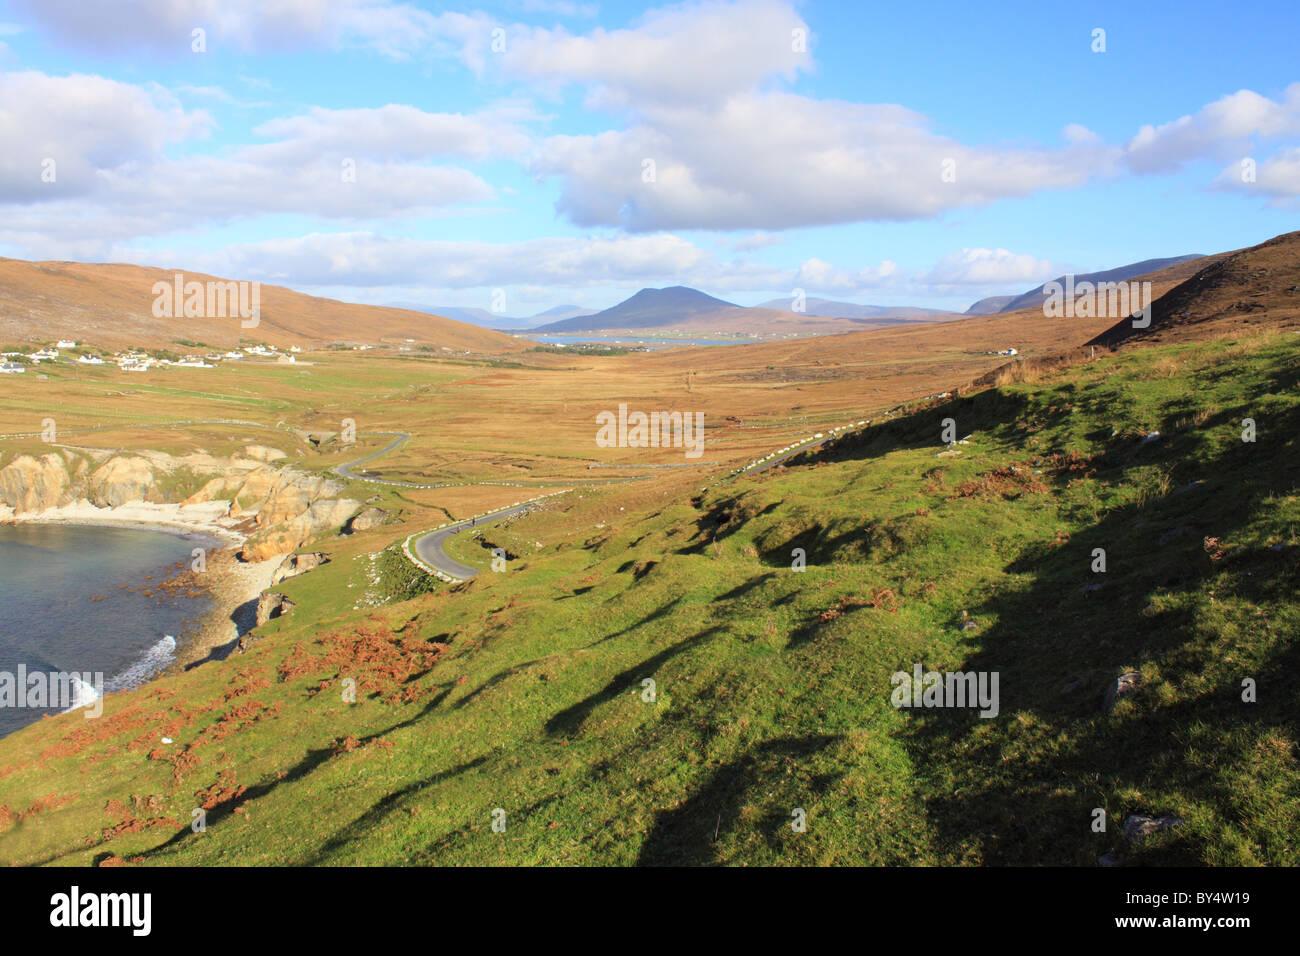 Ashleam, Achill Island, County Mayo, Ireland - Stock Image